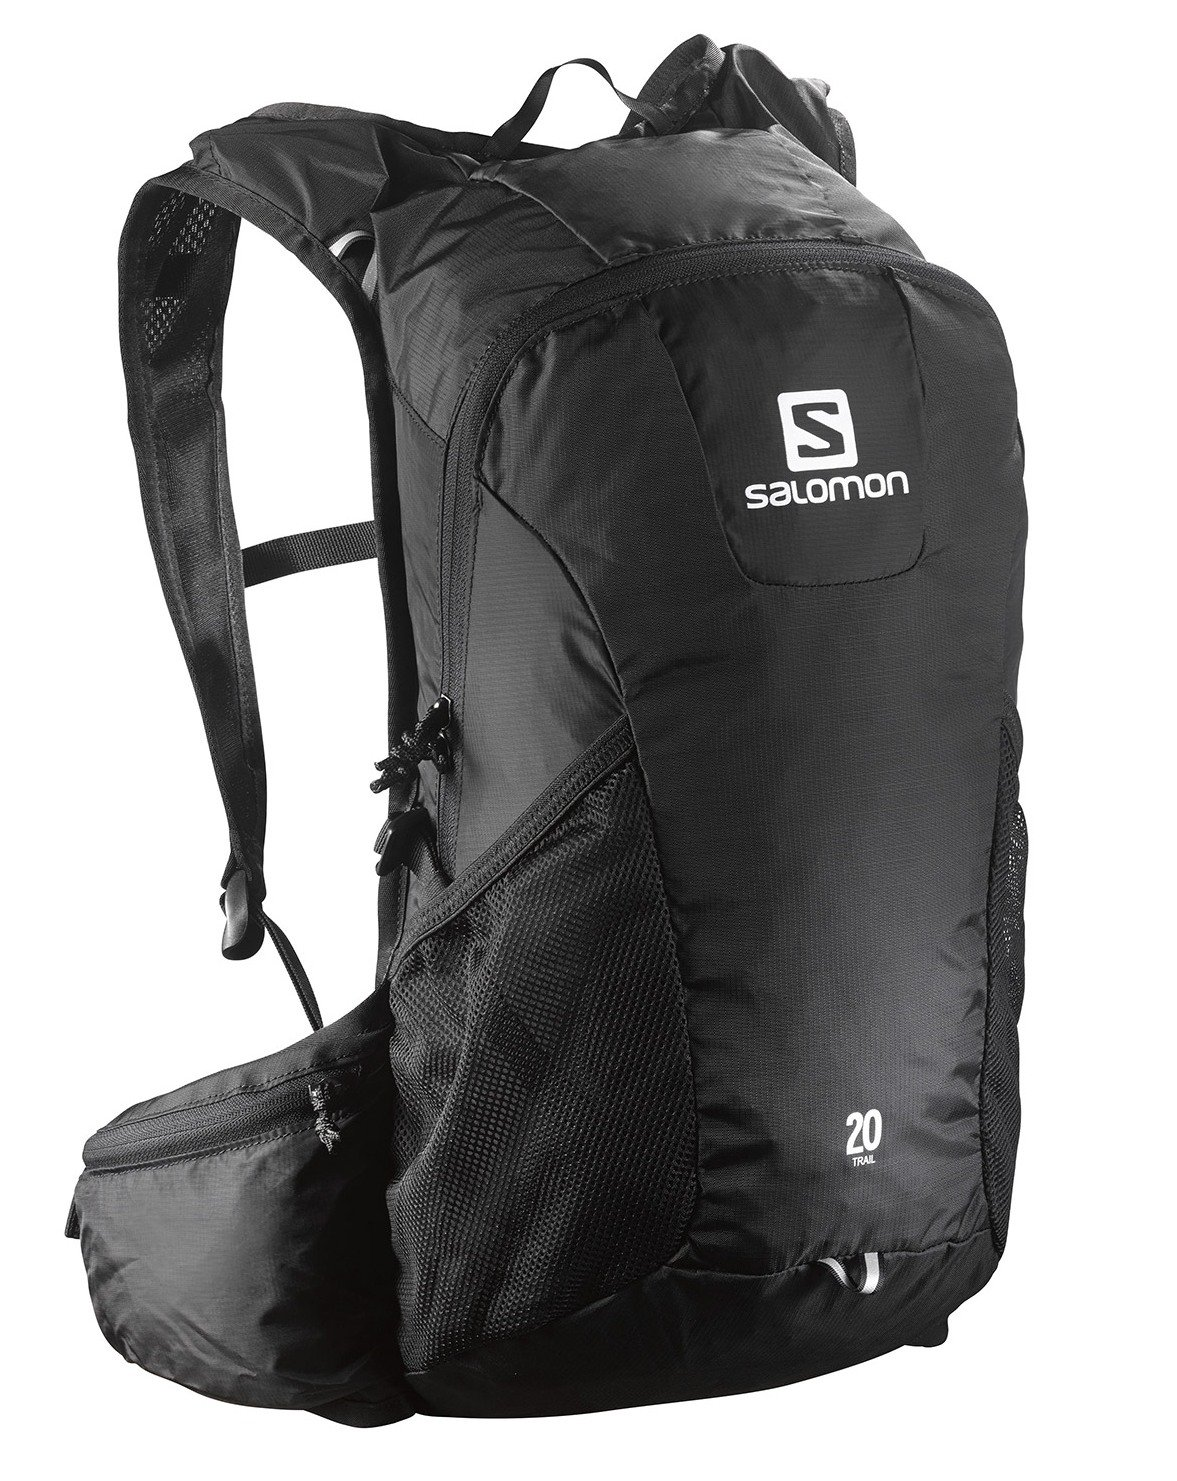 Рюкзаки для бега екатеринбург продажа рюкзаки милтари